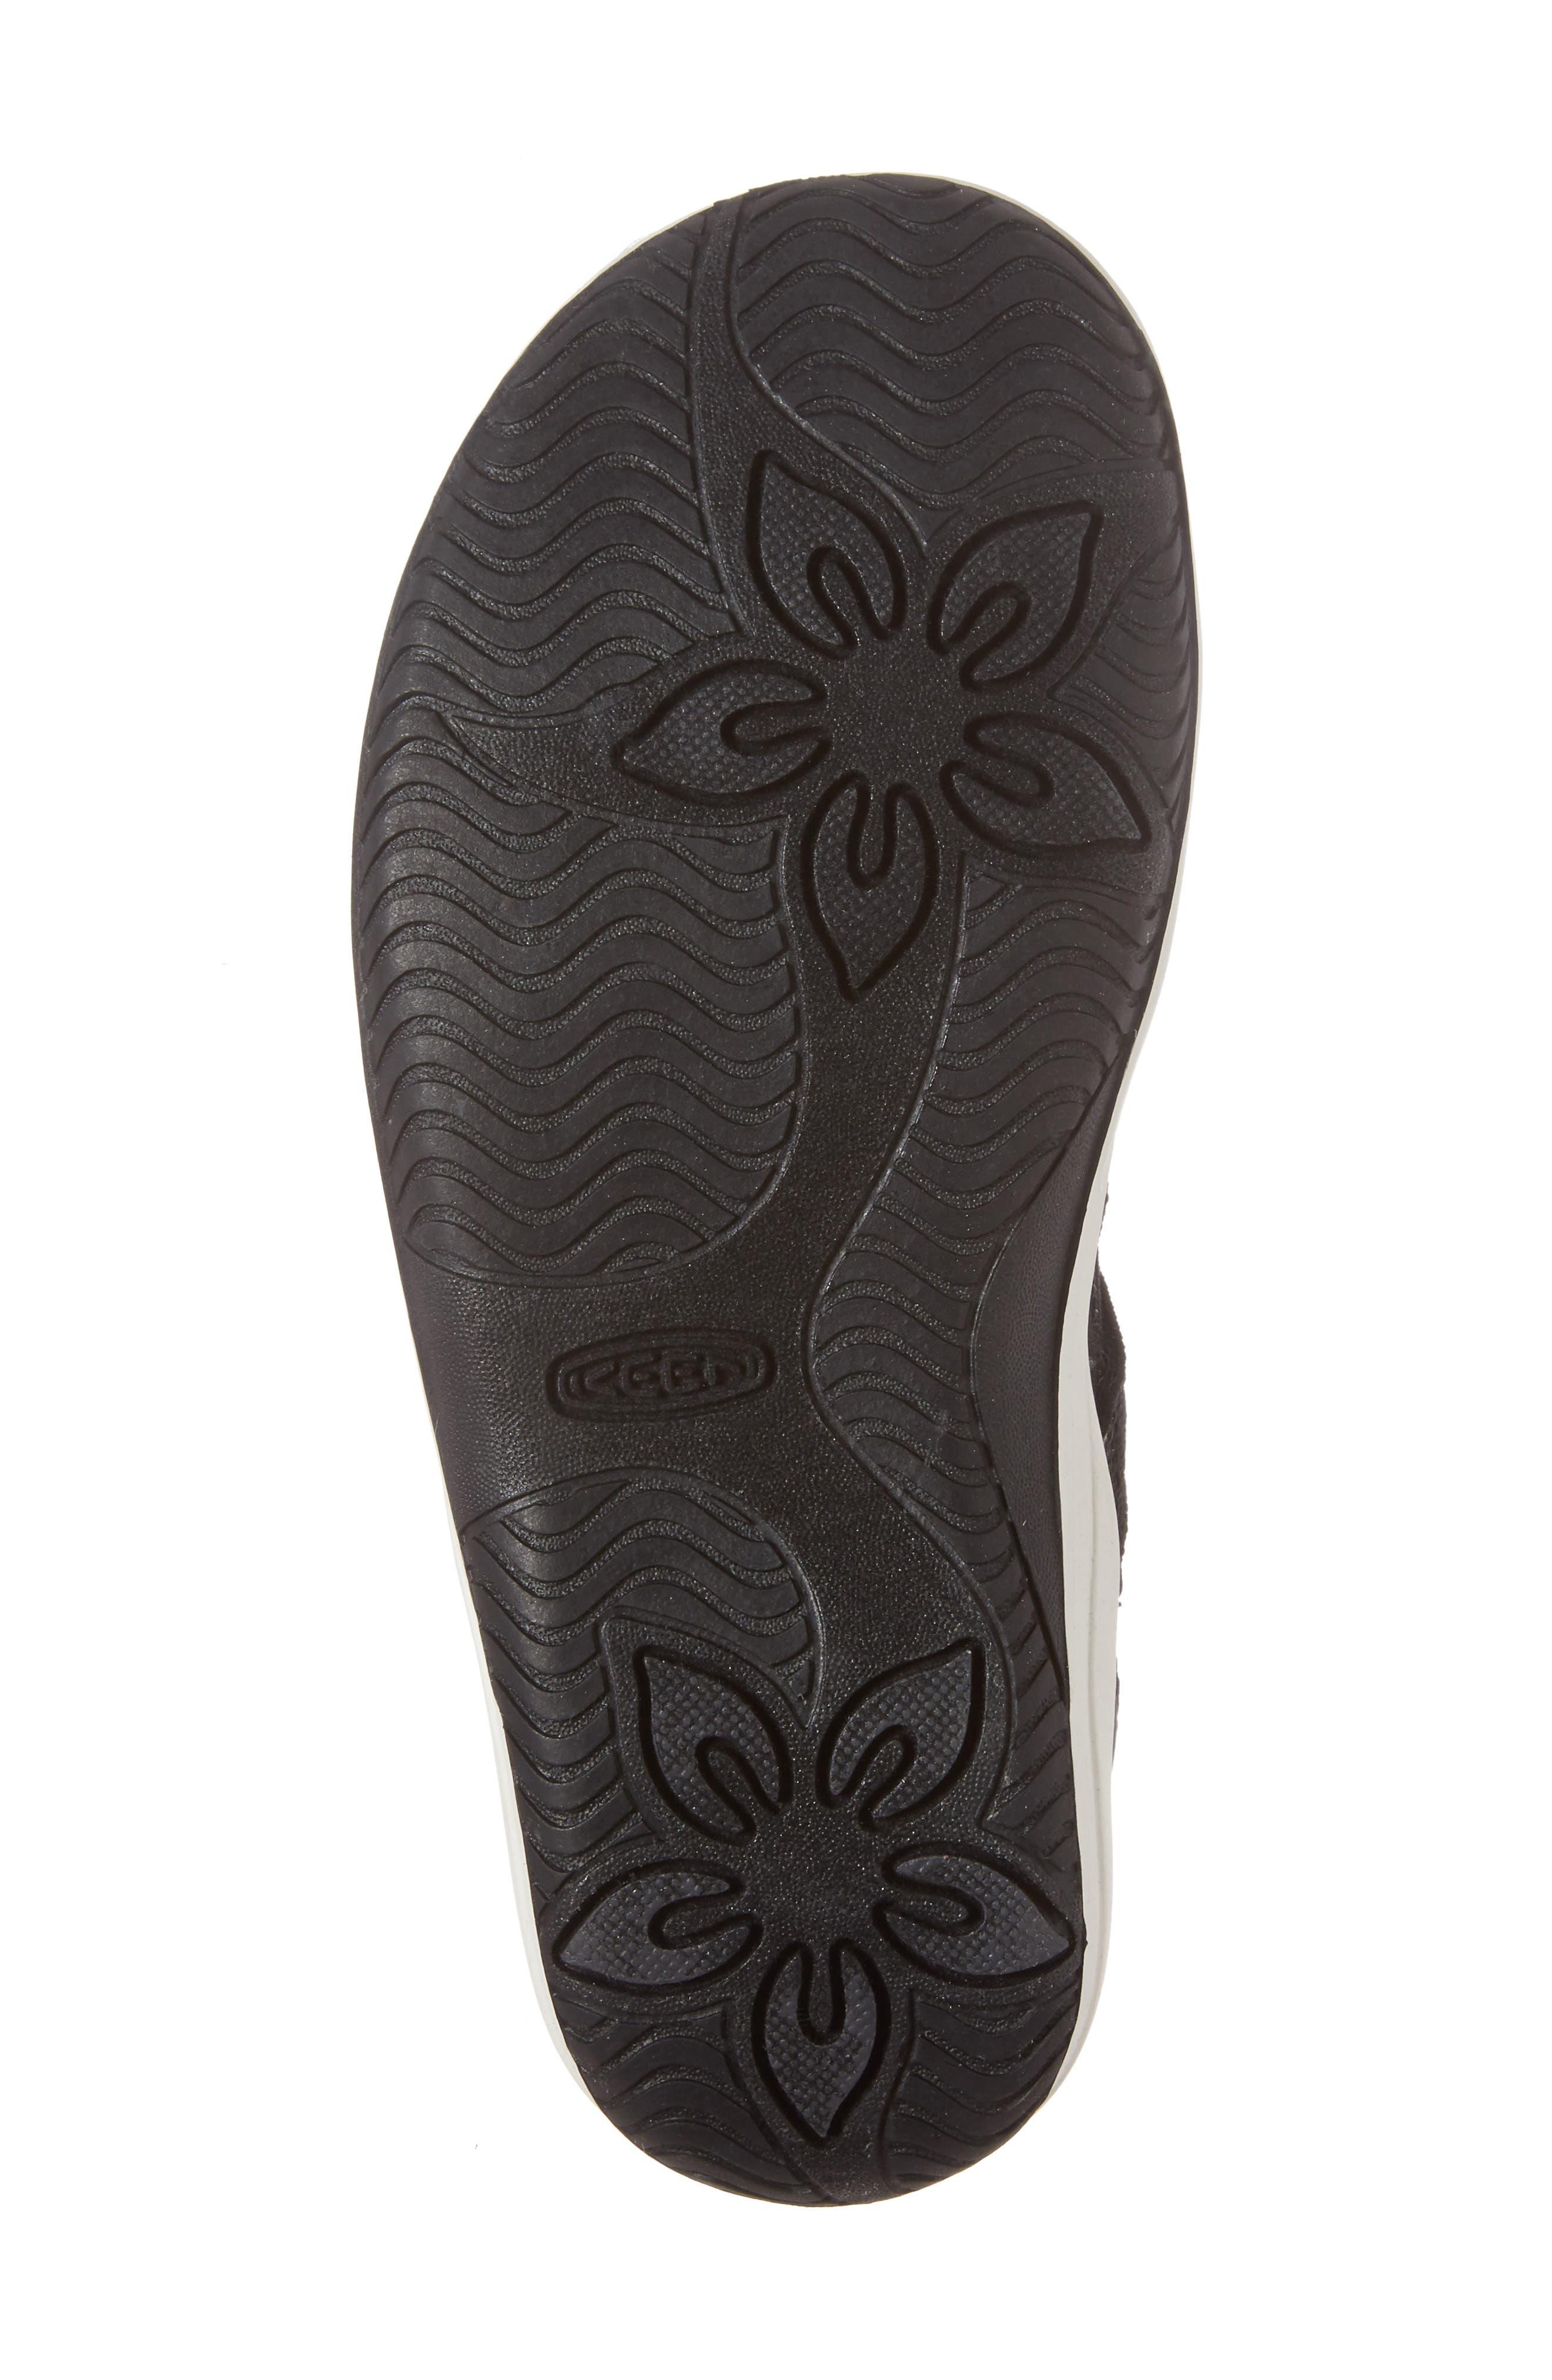 Hadley Adventure Water Friendly Sandal,                             Alternate thumbnail 6, color,                             Black/ White